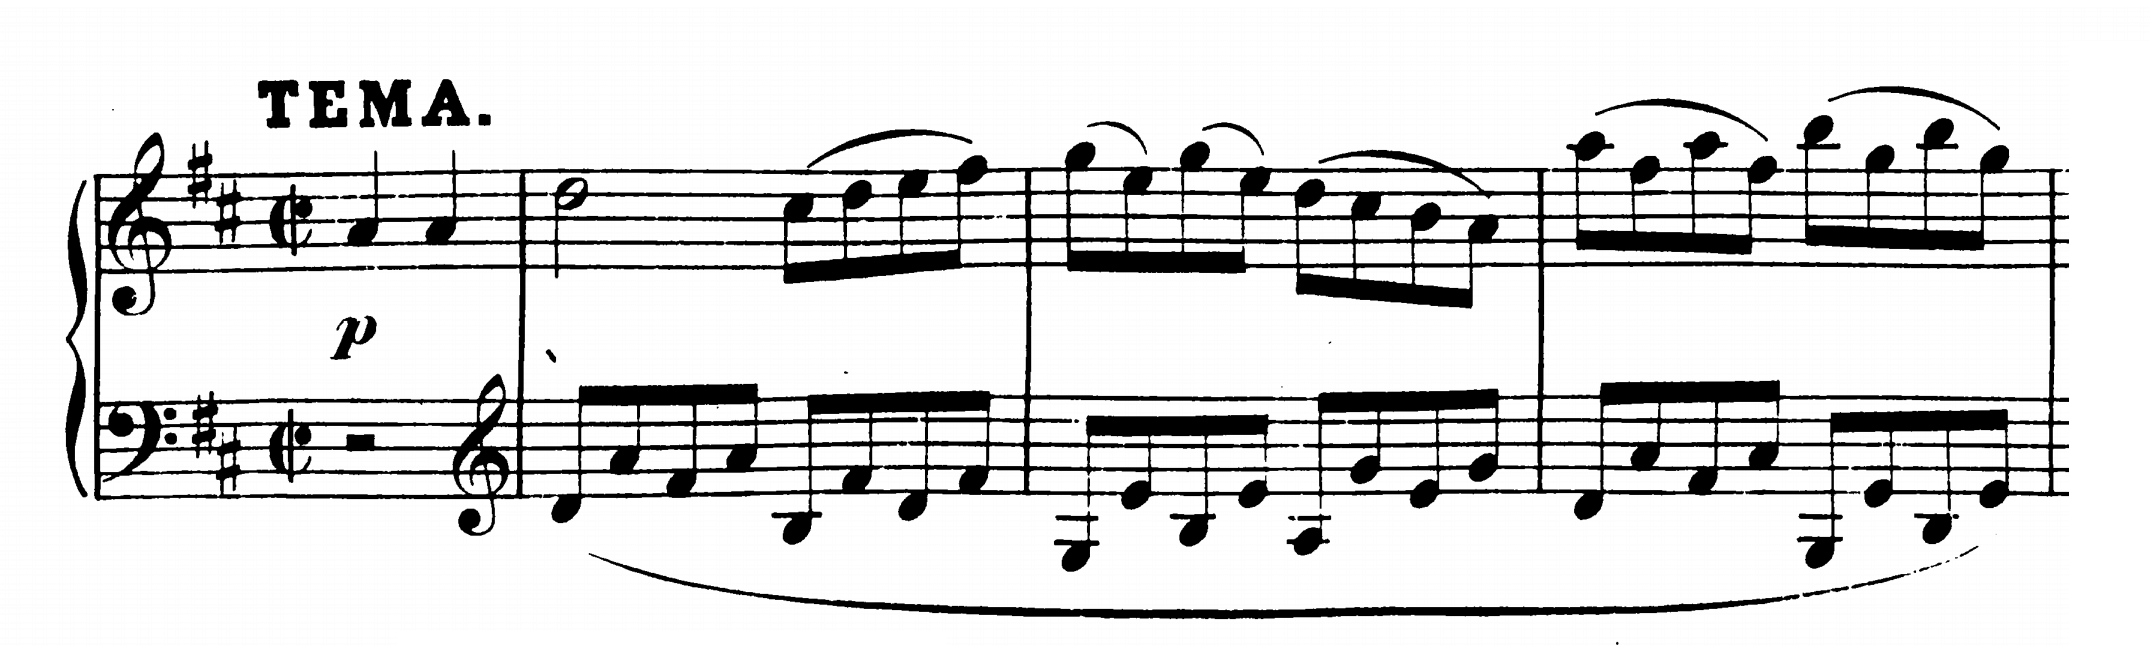 THREE SONATAS PIANO SONATAS 6